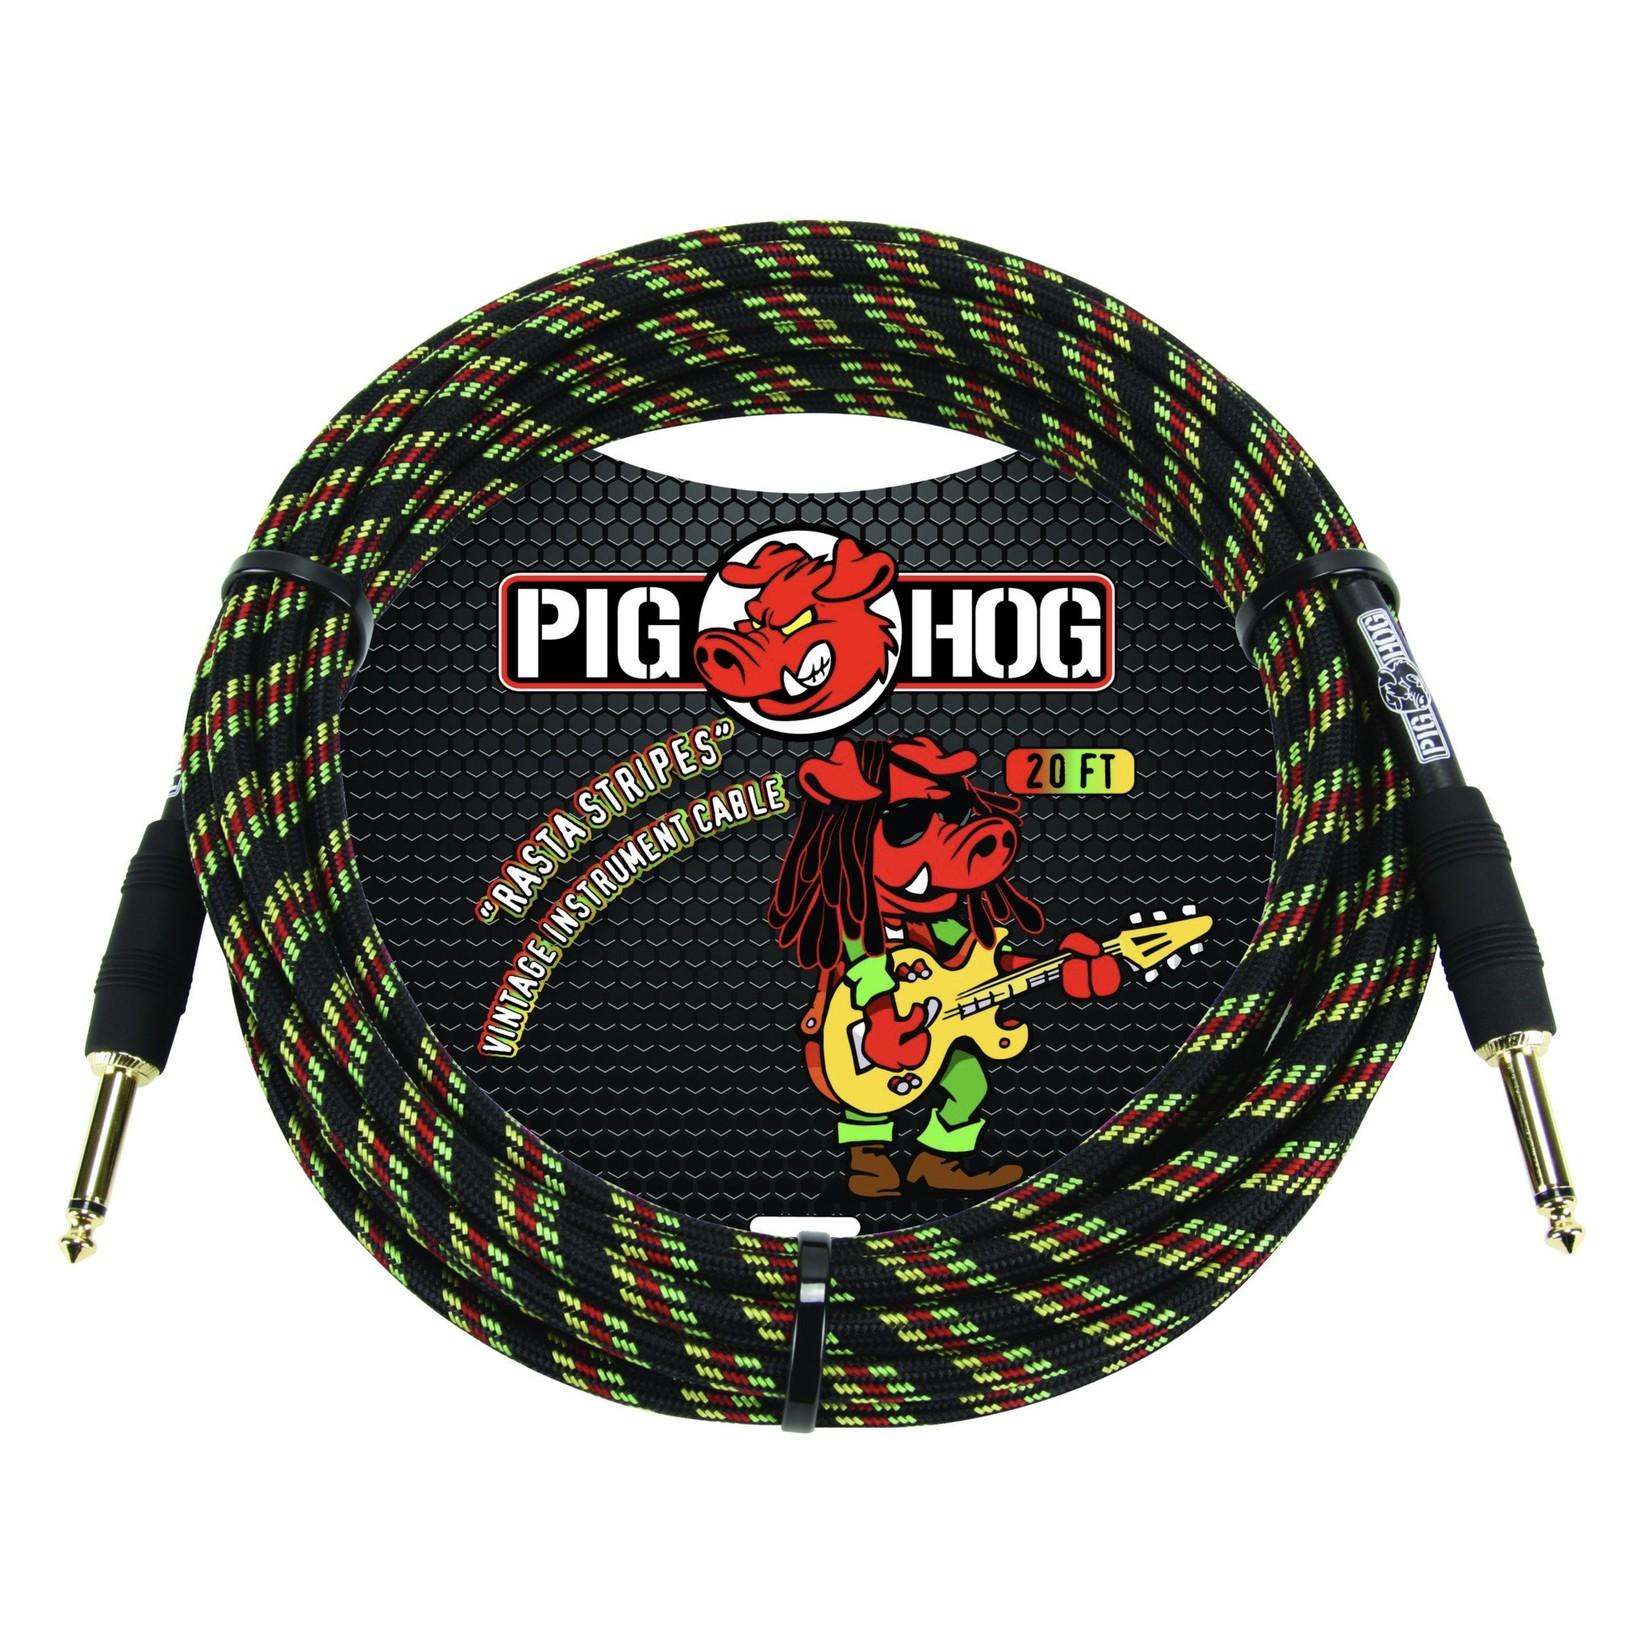 "Pig Hog Pig Hog ""Rasta Stripes"" Vintage Woven Instrument Cable - 10 FT Straight 1/4"" Plugs (PCH10RA), Reggae"